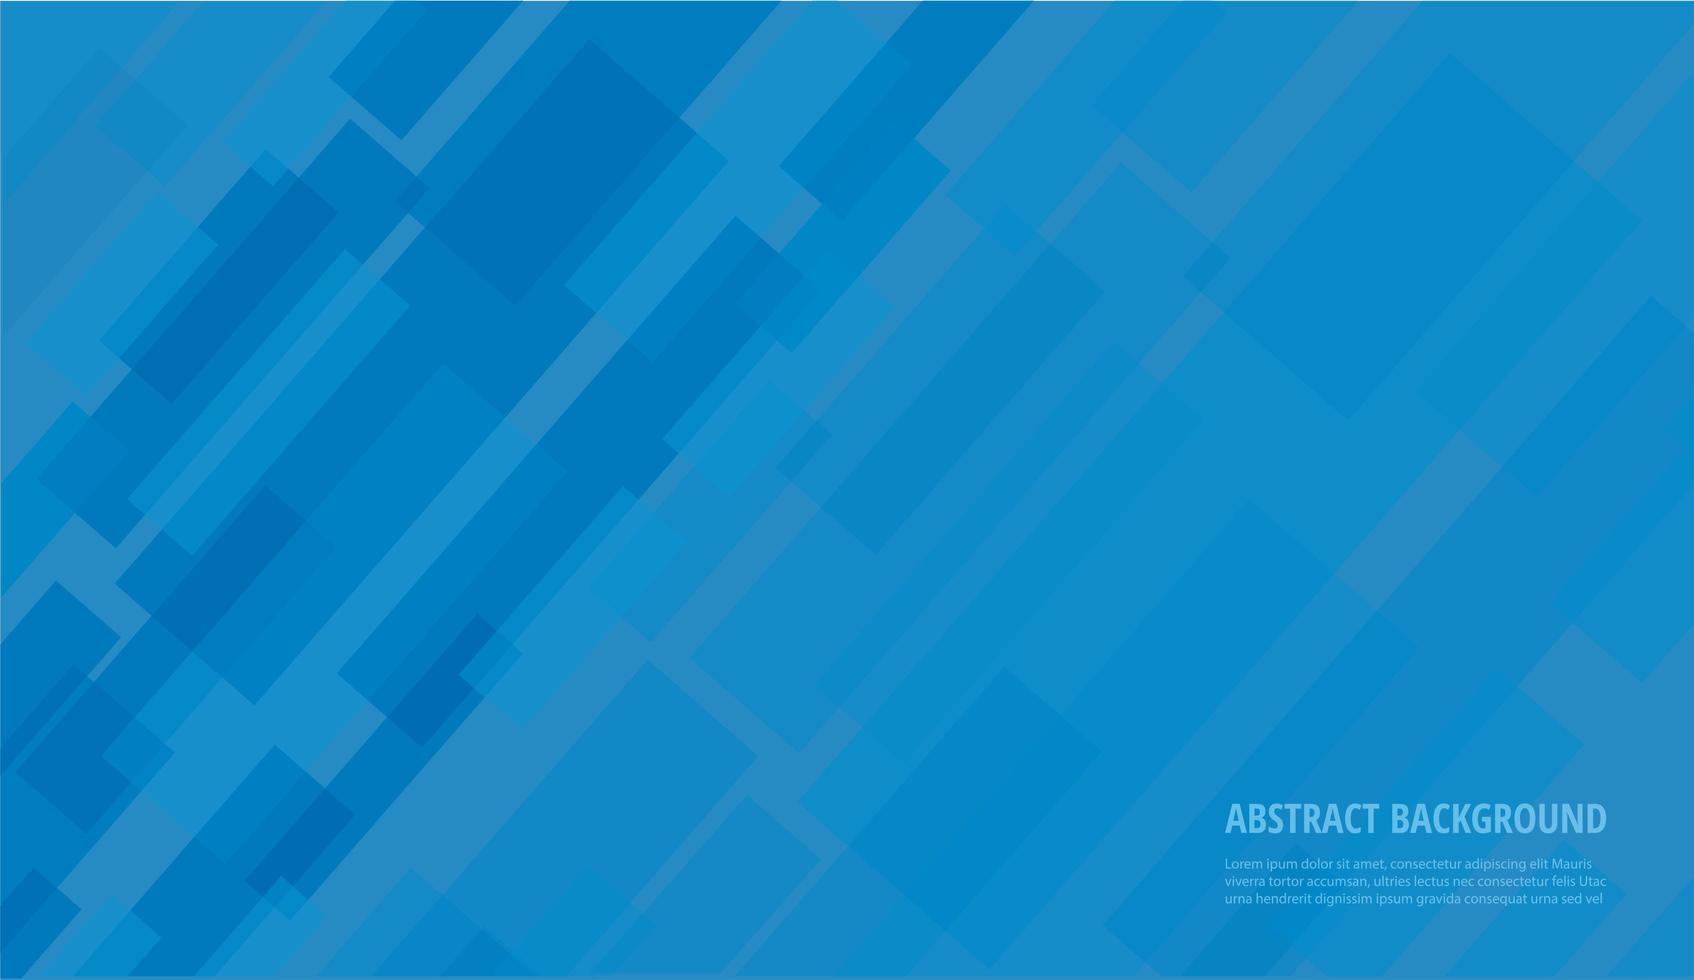 abstract licht strepen blauw behang vector